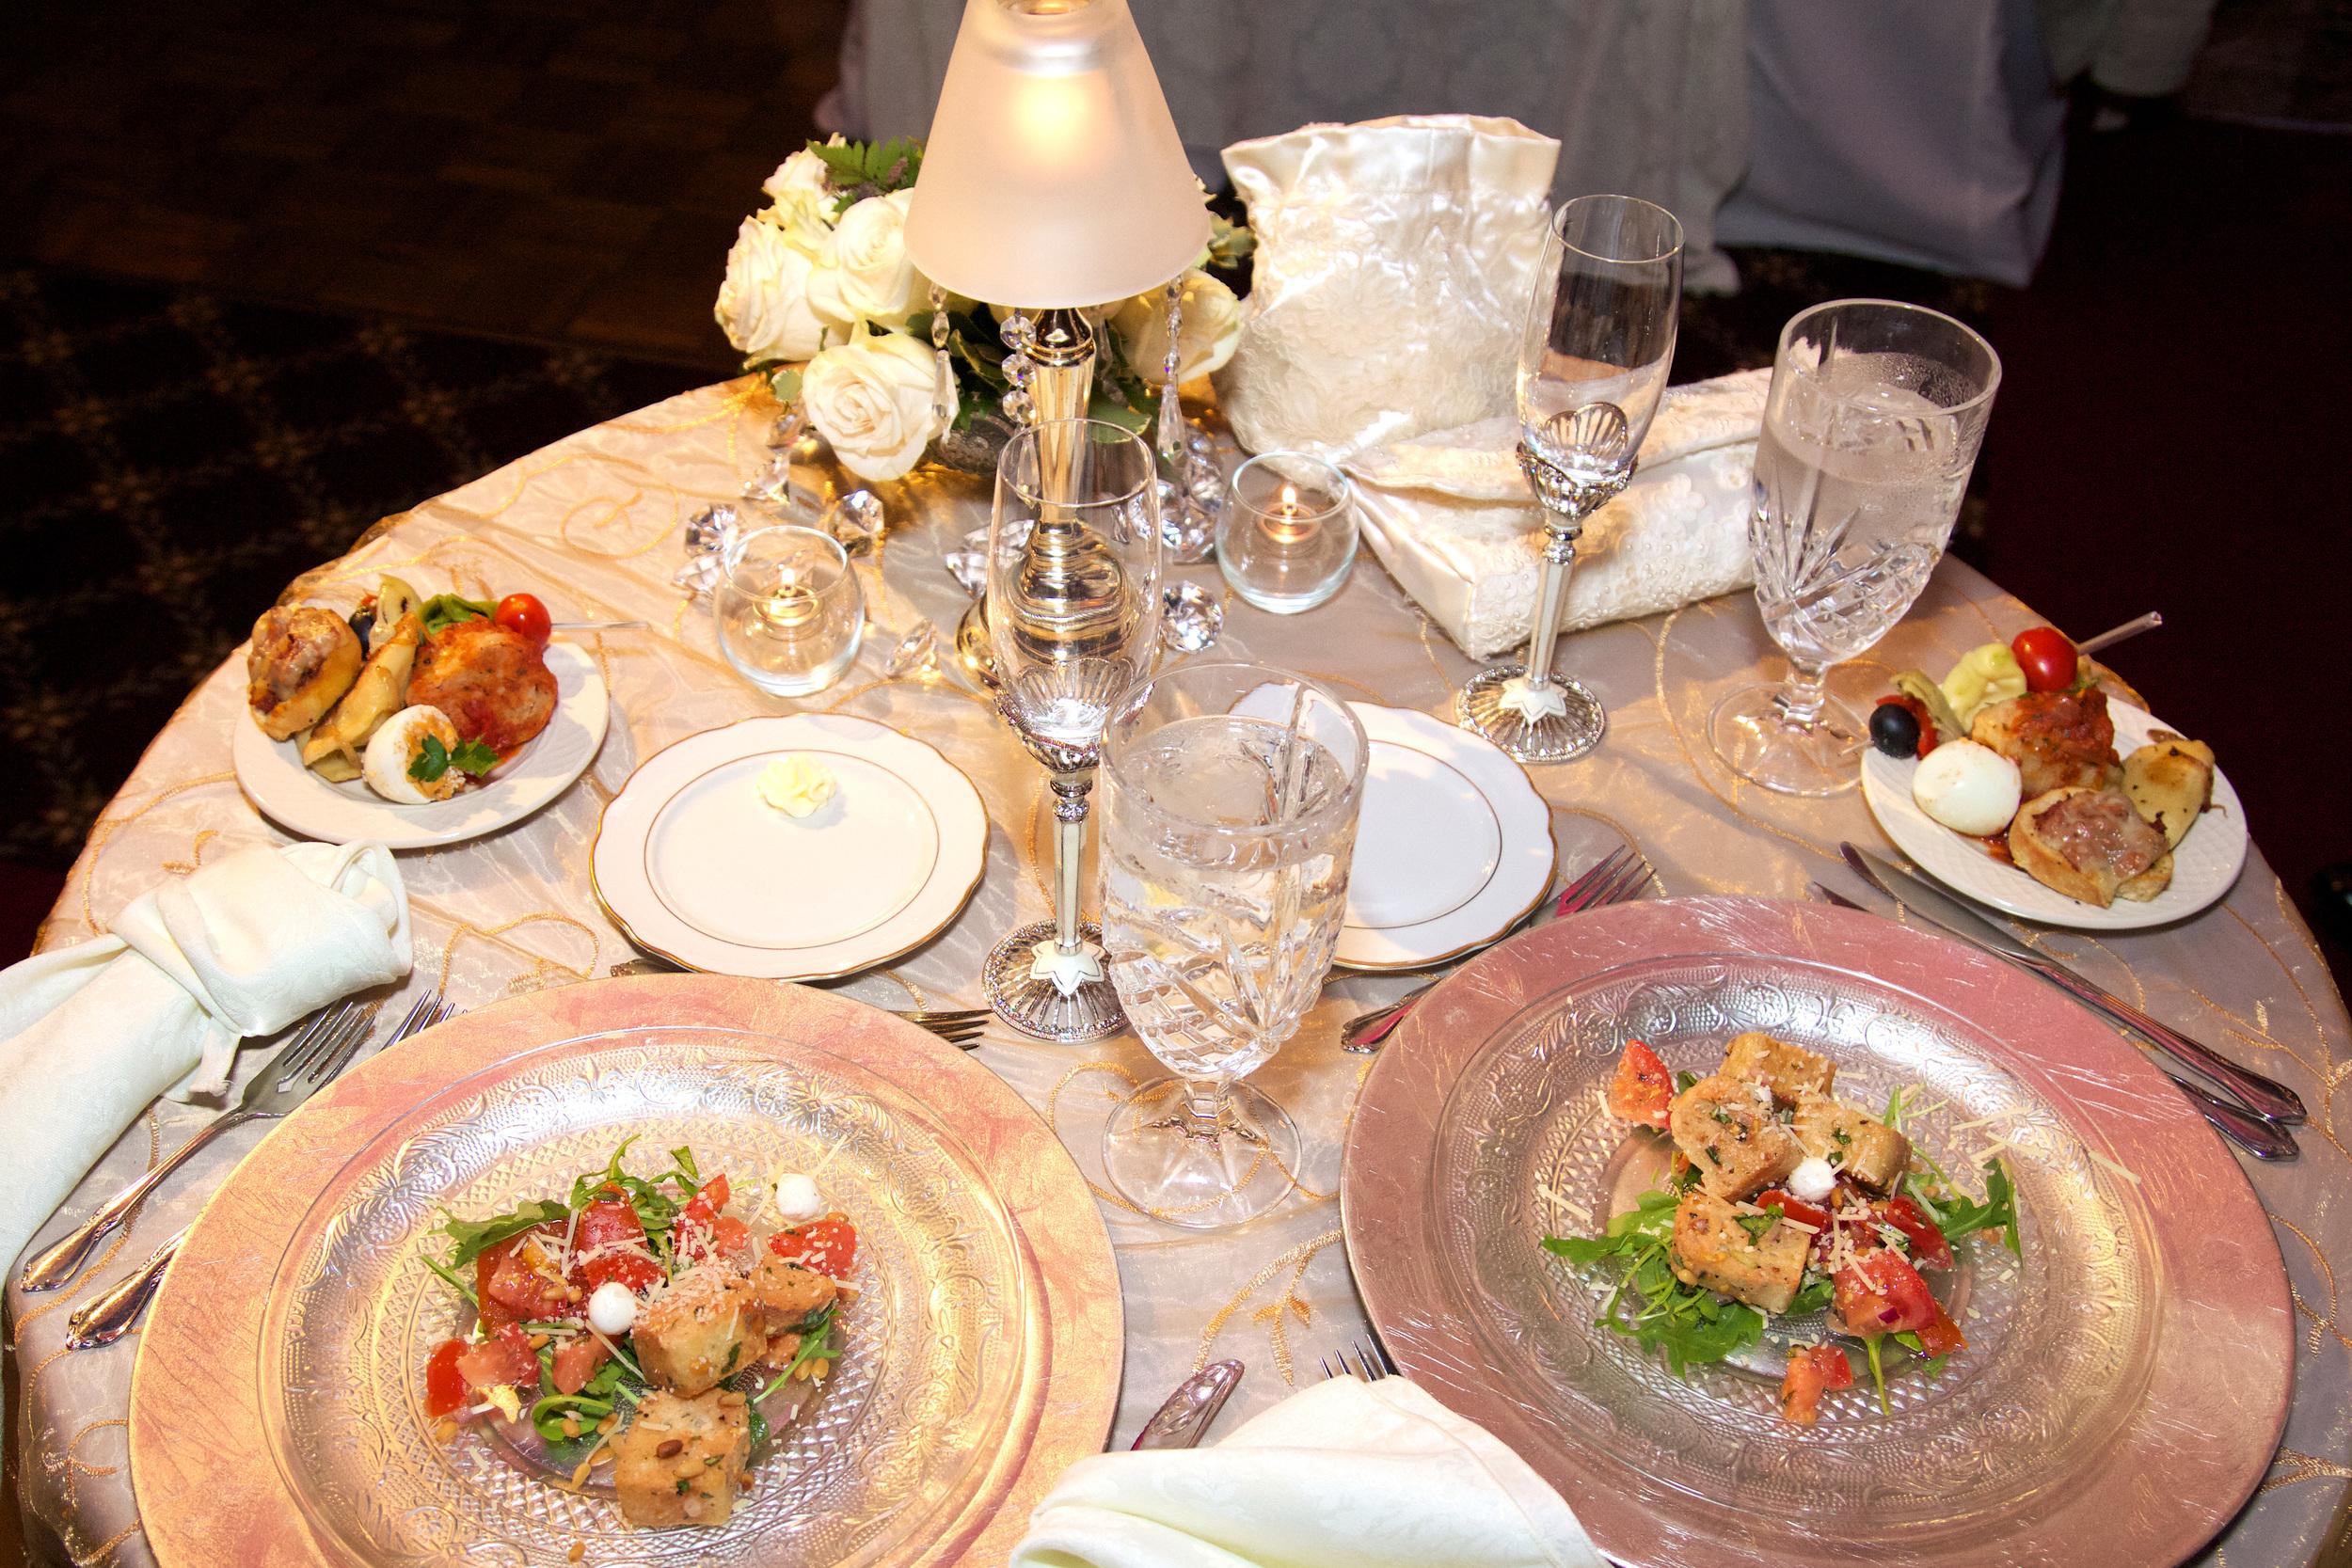 Panzanella Salad and Hors D'ouervres